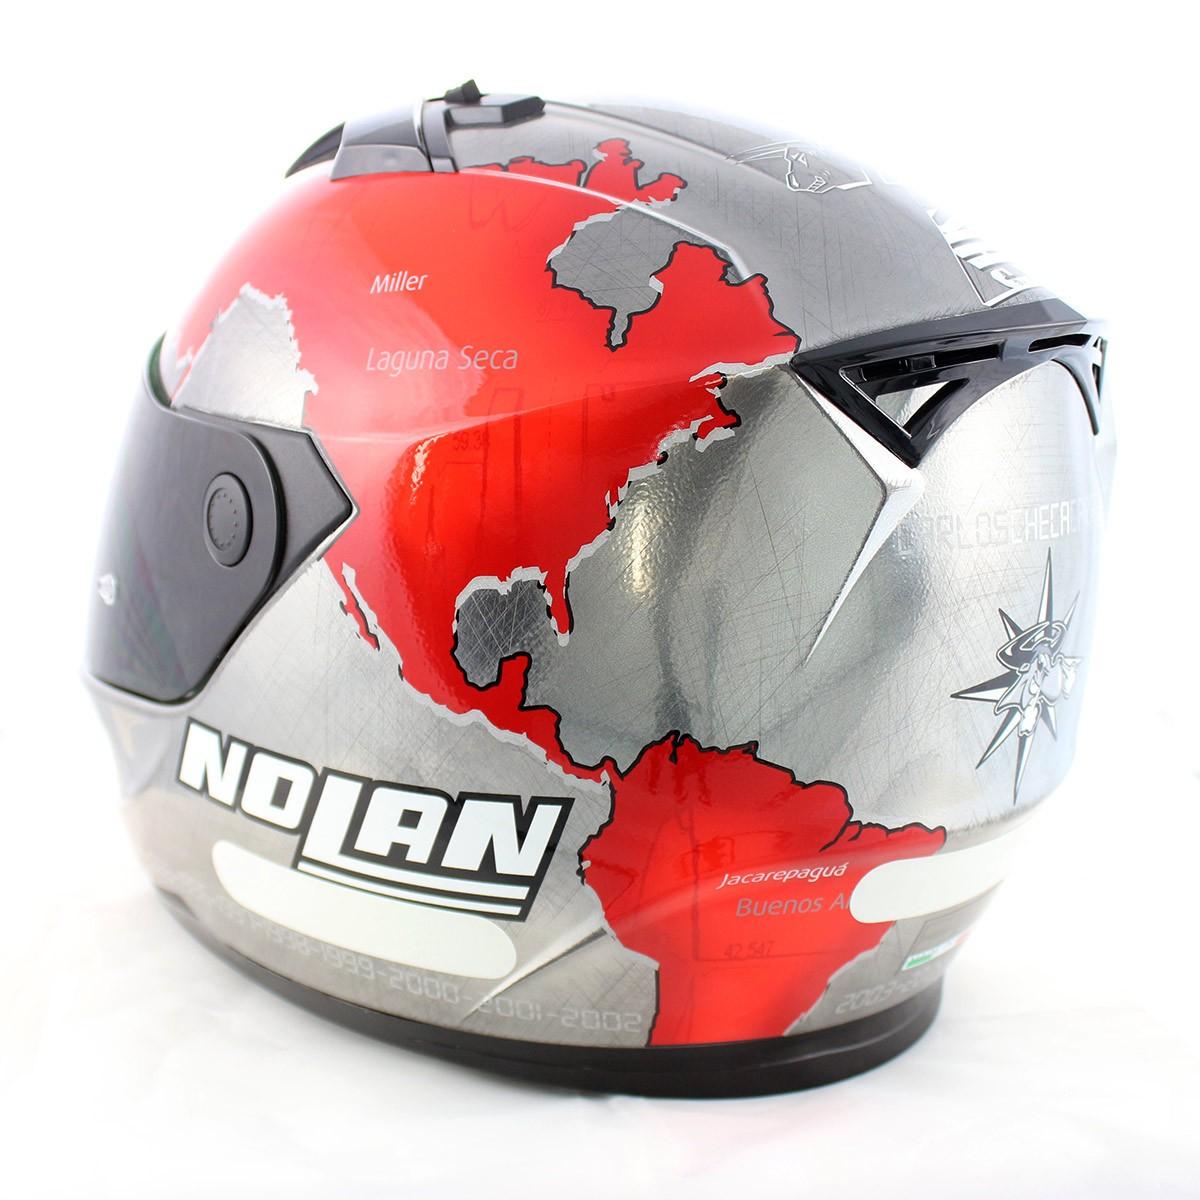 Capacete Nolan N64 Gemini Réplica C.Checca Scratched Chrome - GANHE VISEIRA FUMÊ - BLACK FRIDAY  - Planet Bike Shop Moto Acessórios